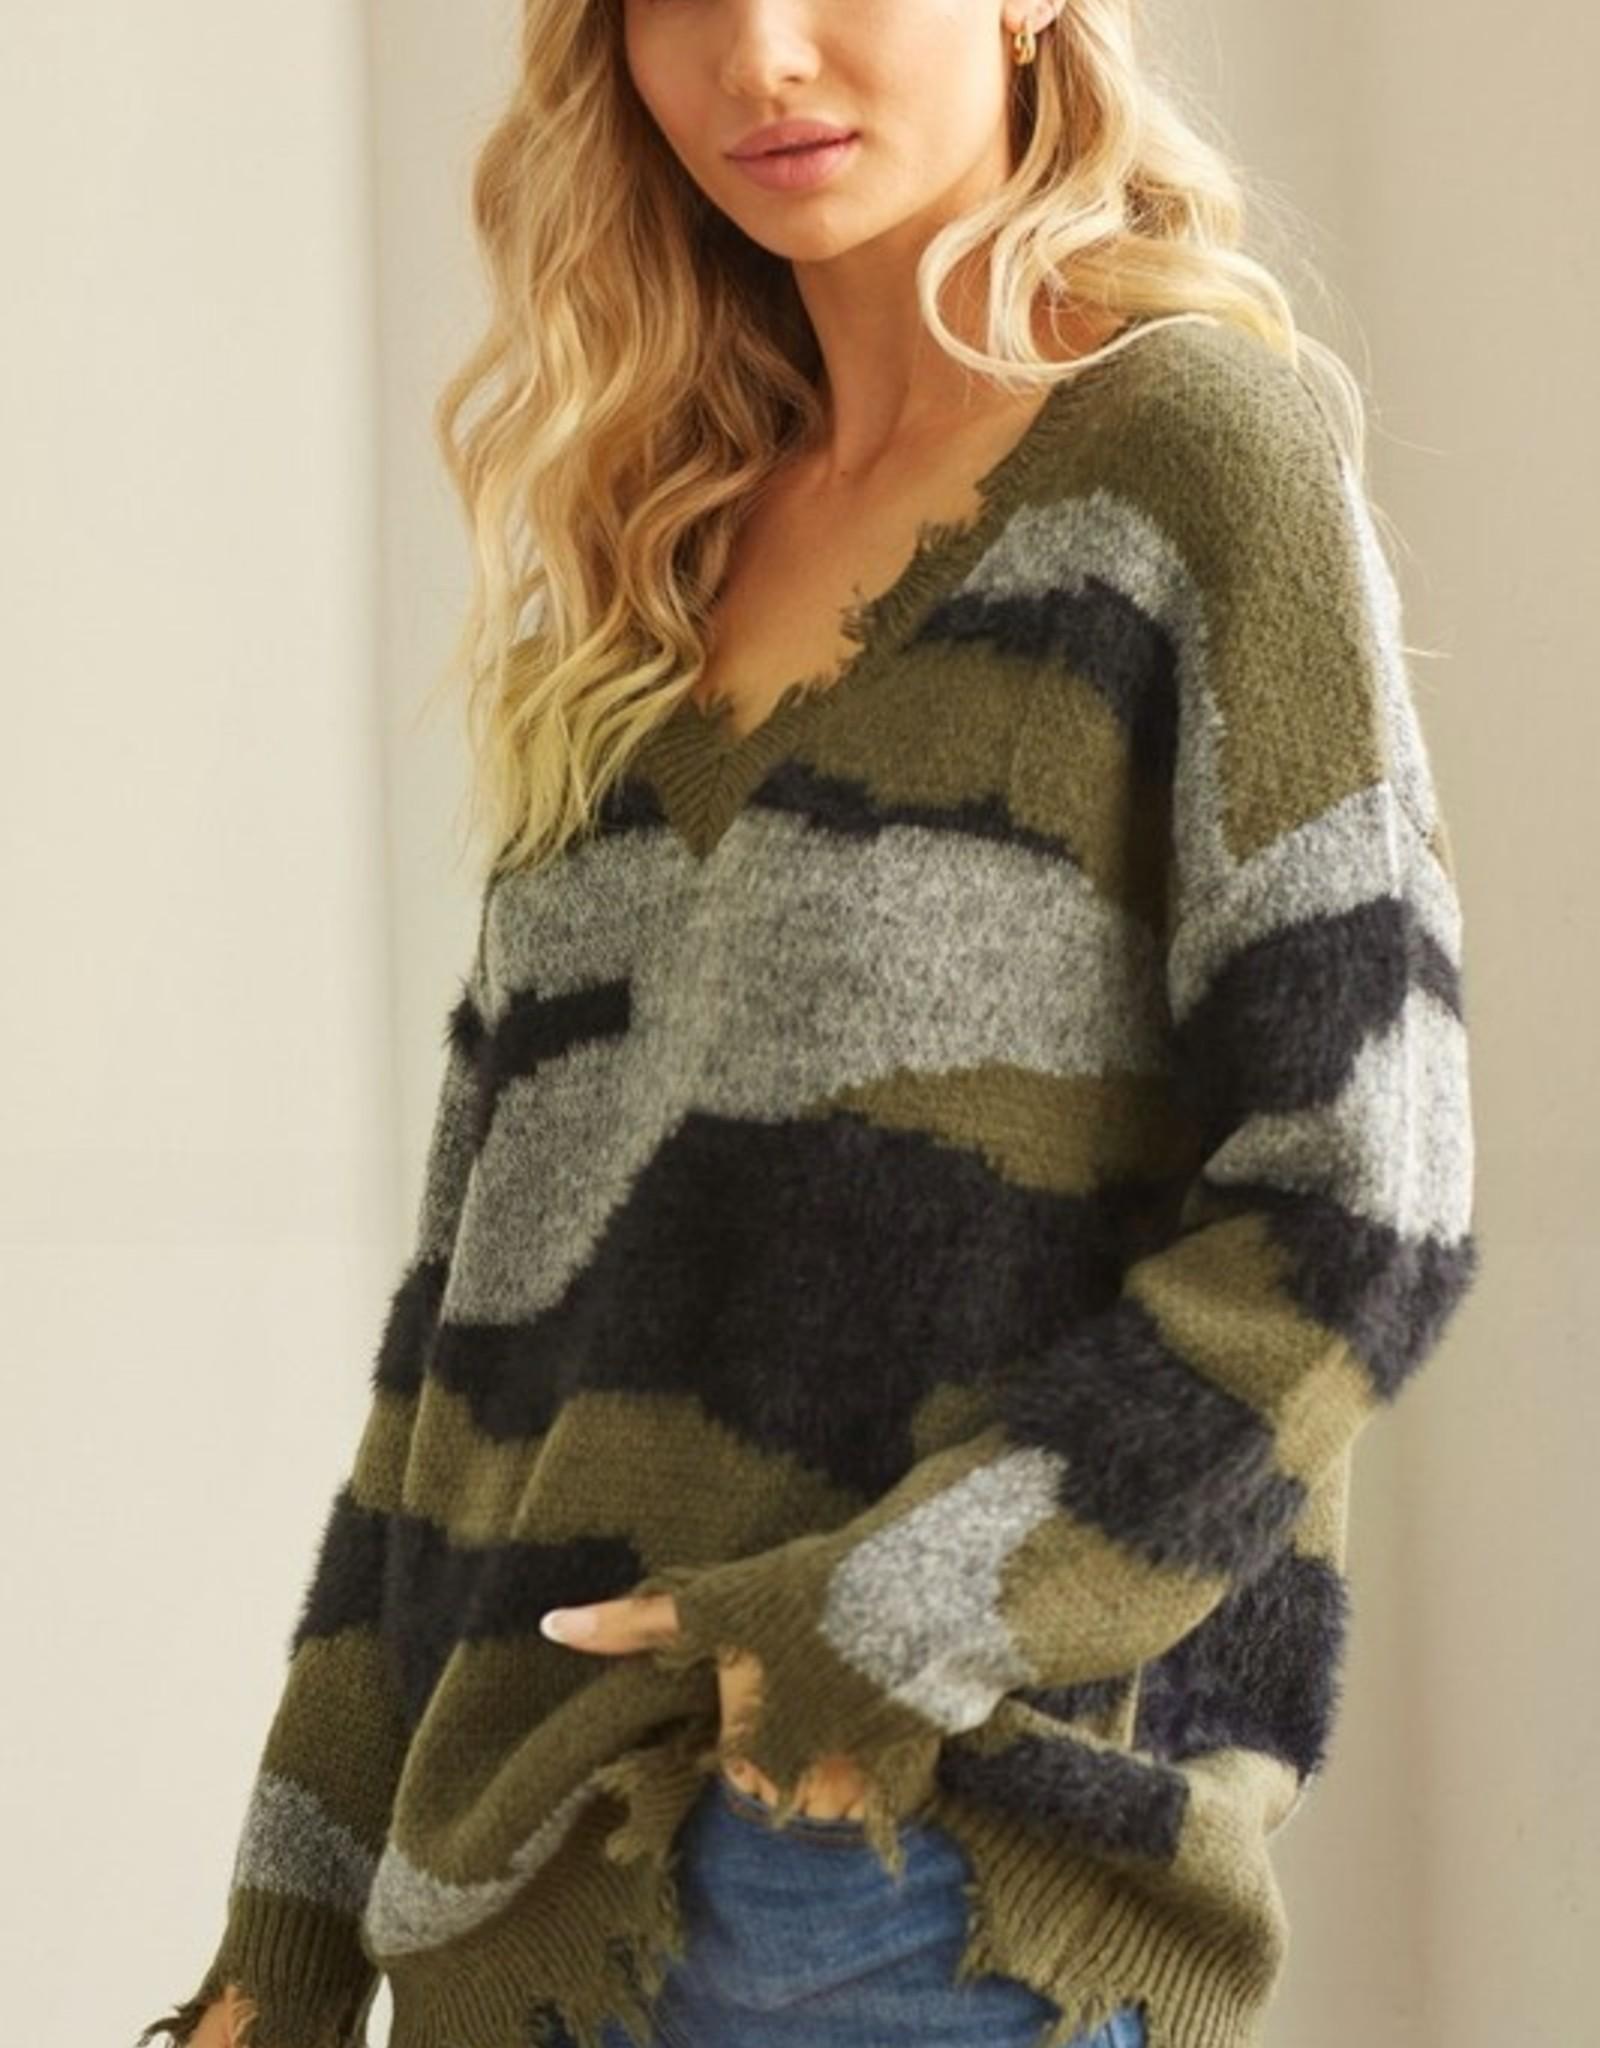 Distressed camo sweater